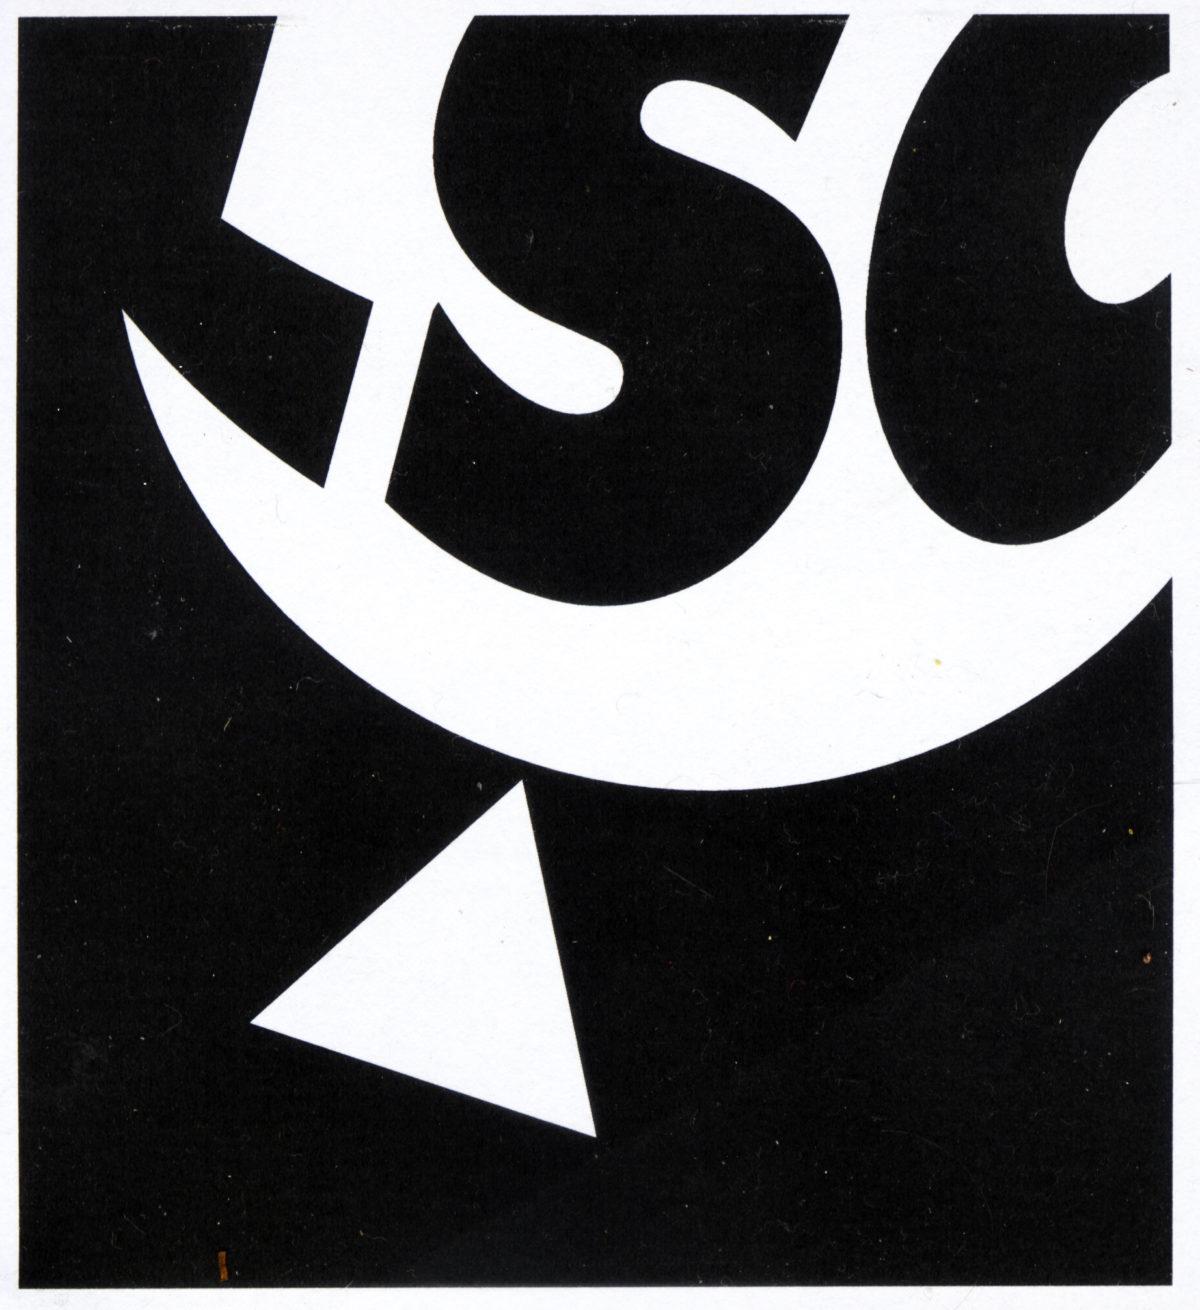 LSC Ballon